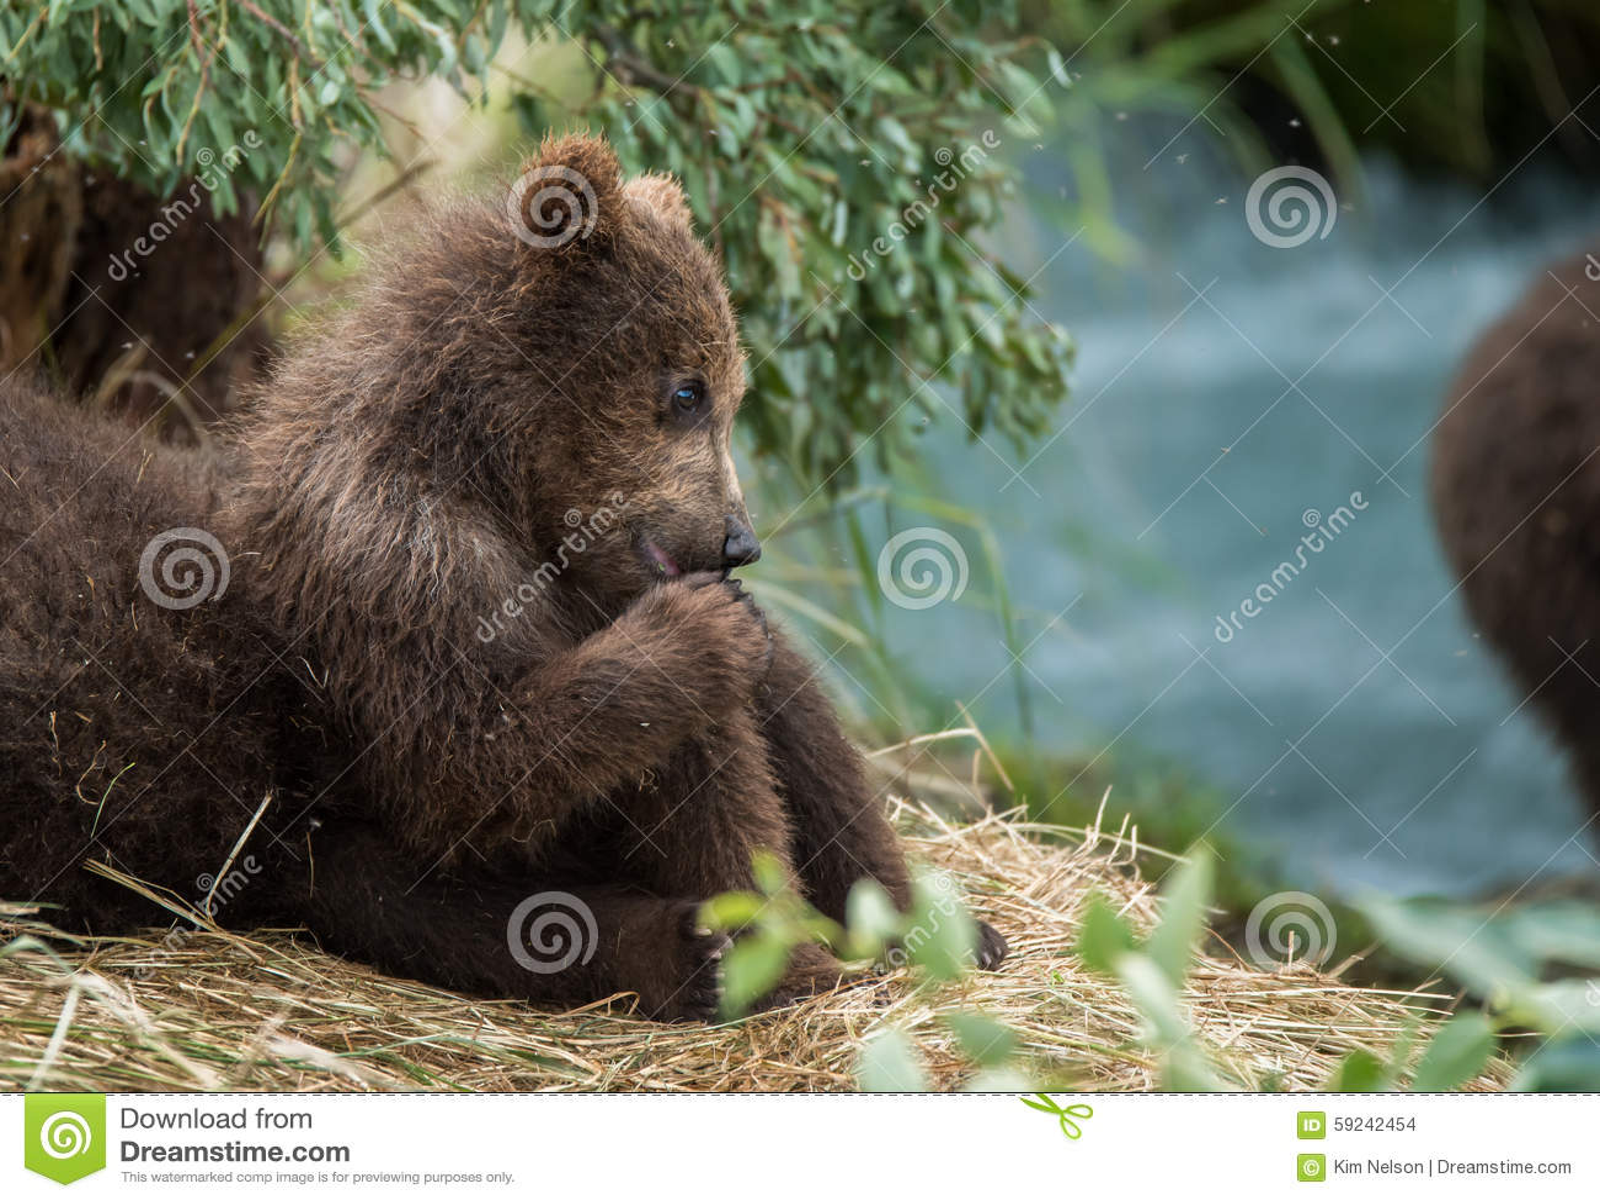 Cute Baby Bear Keeping An Eye On Mom Stock Photo - Image ...